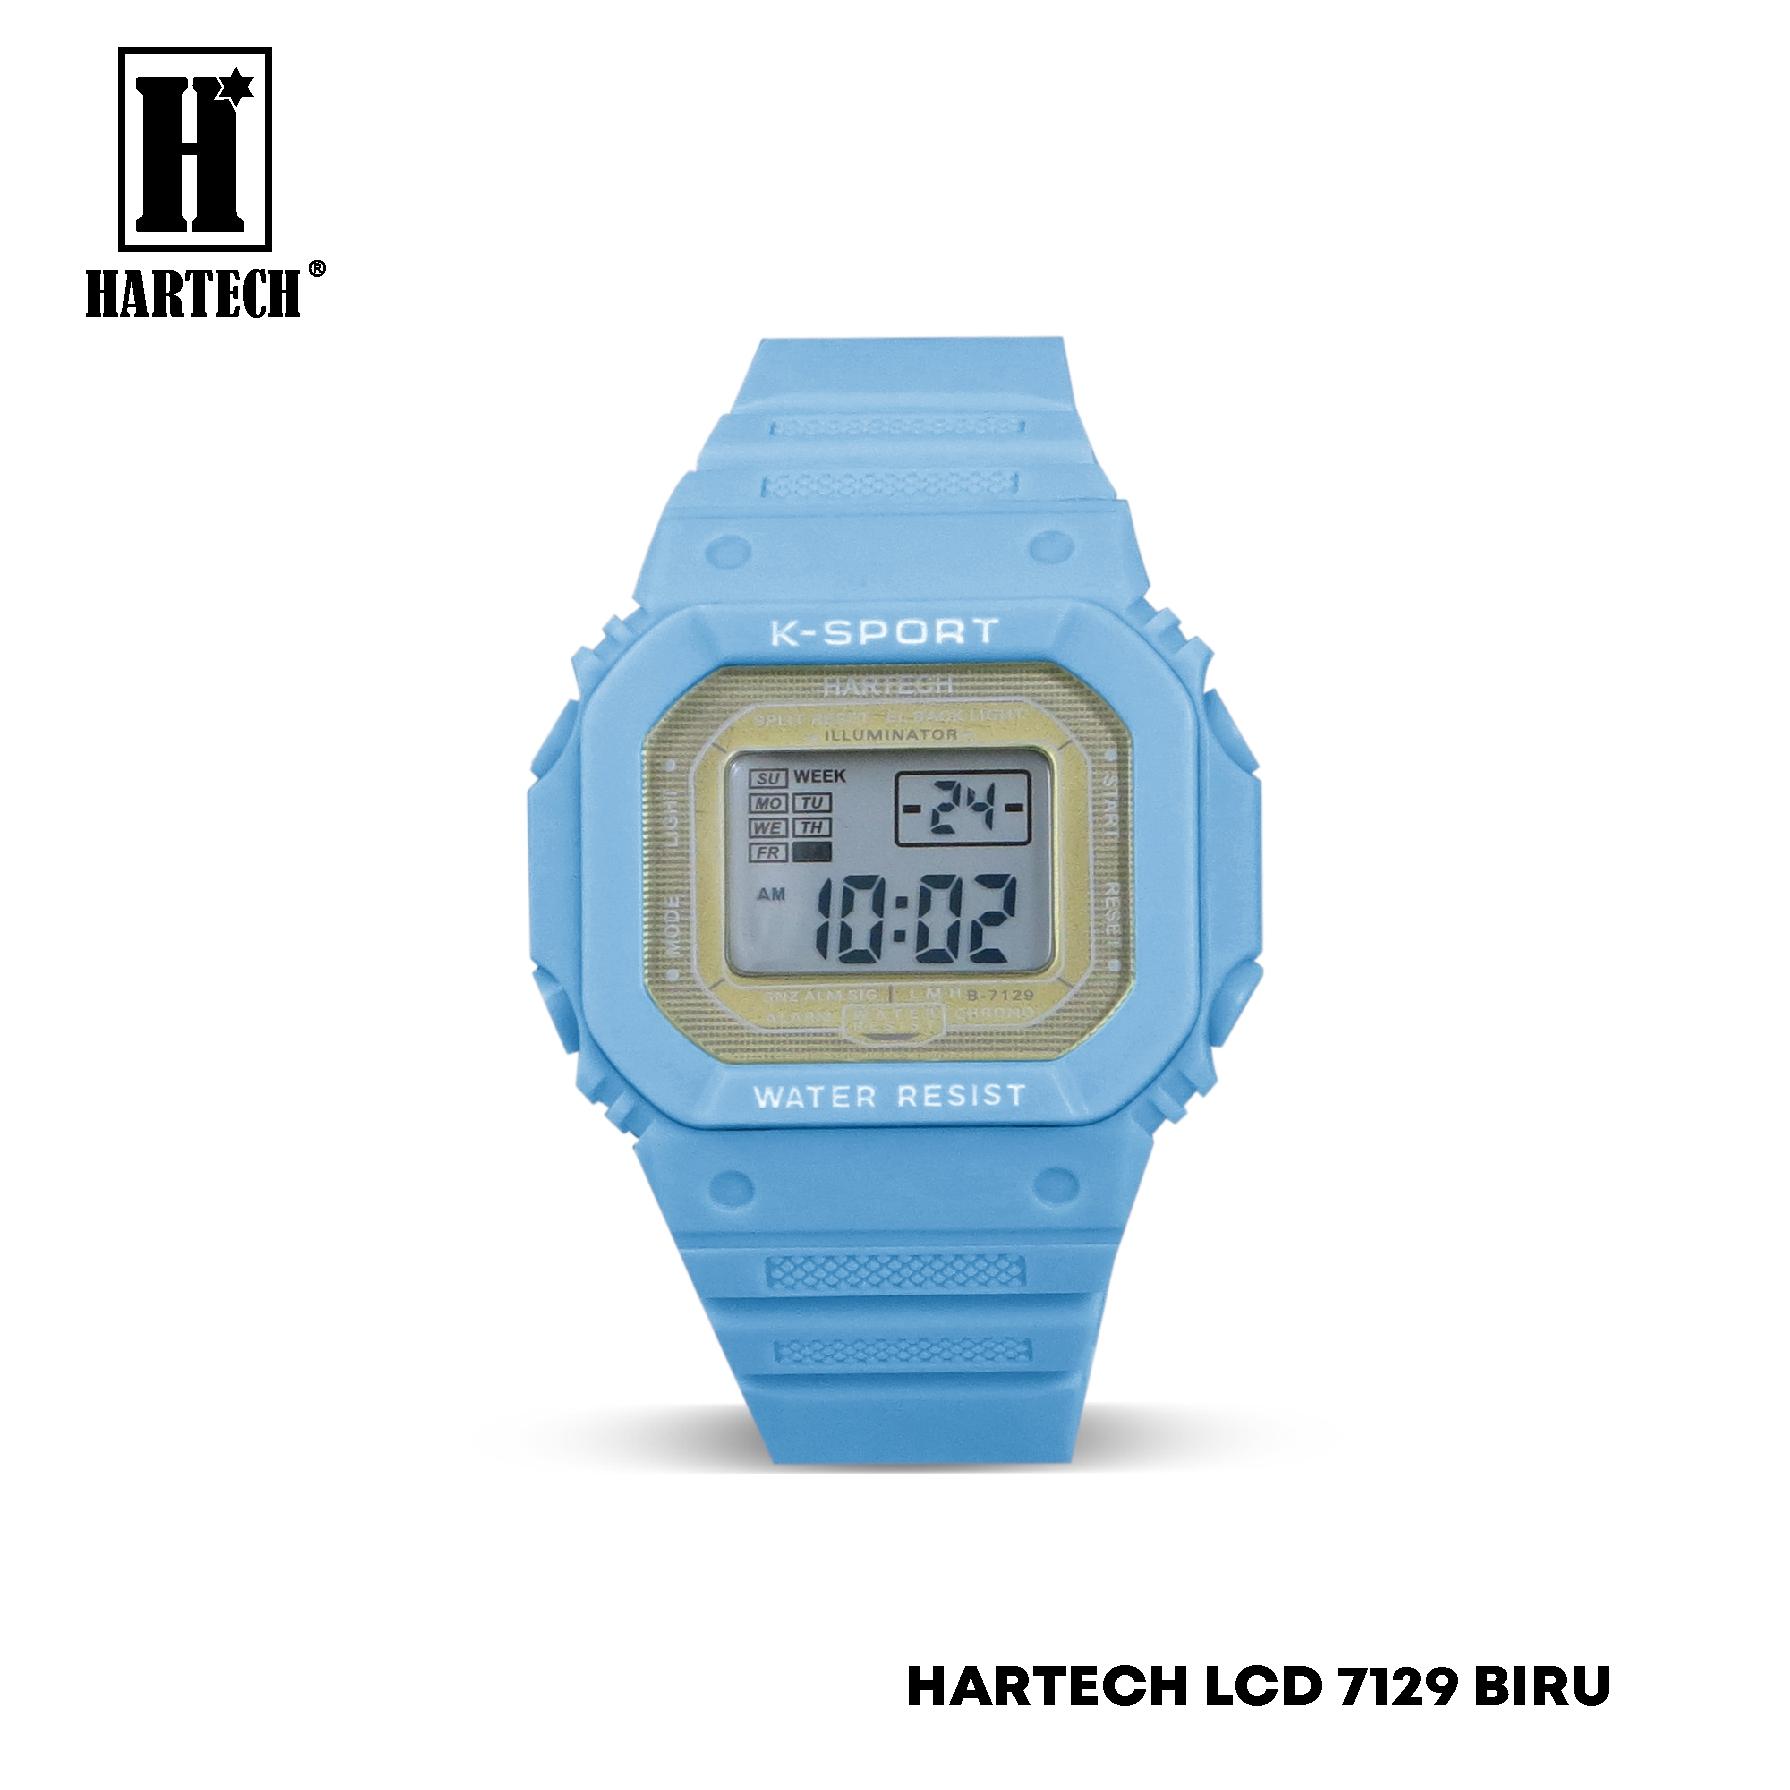 HARTECH LCD C 7129 SERIES